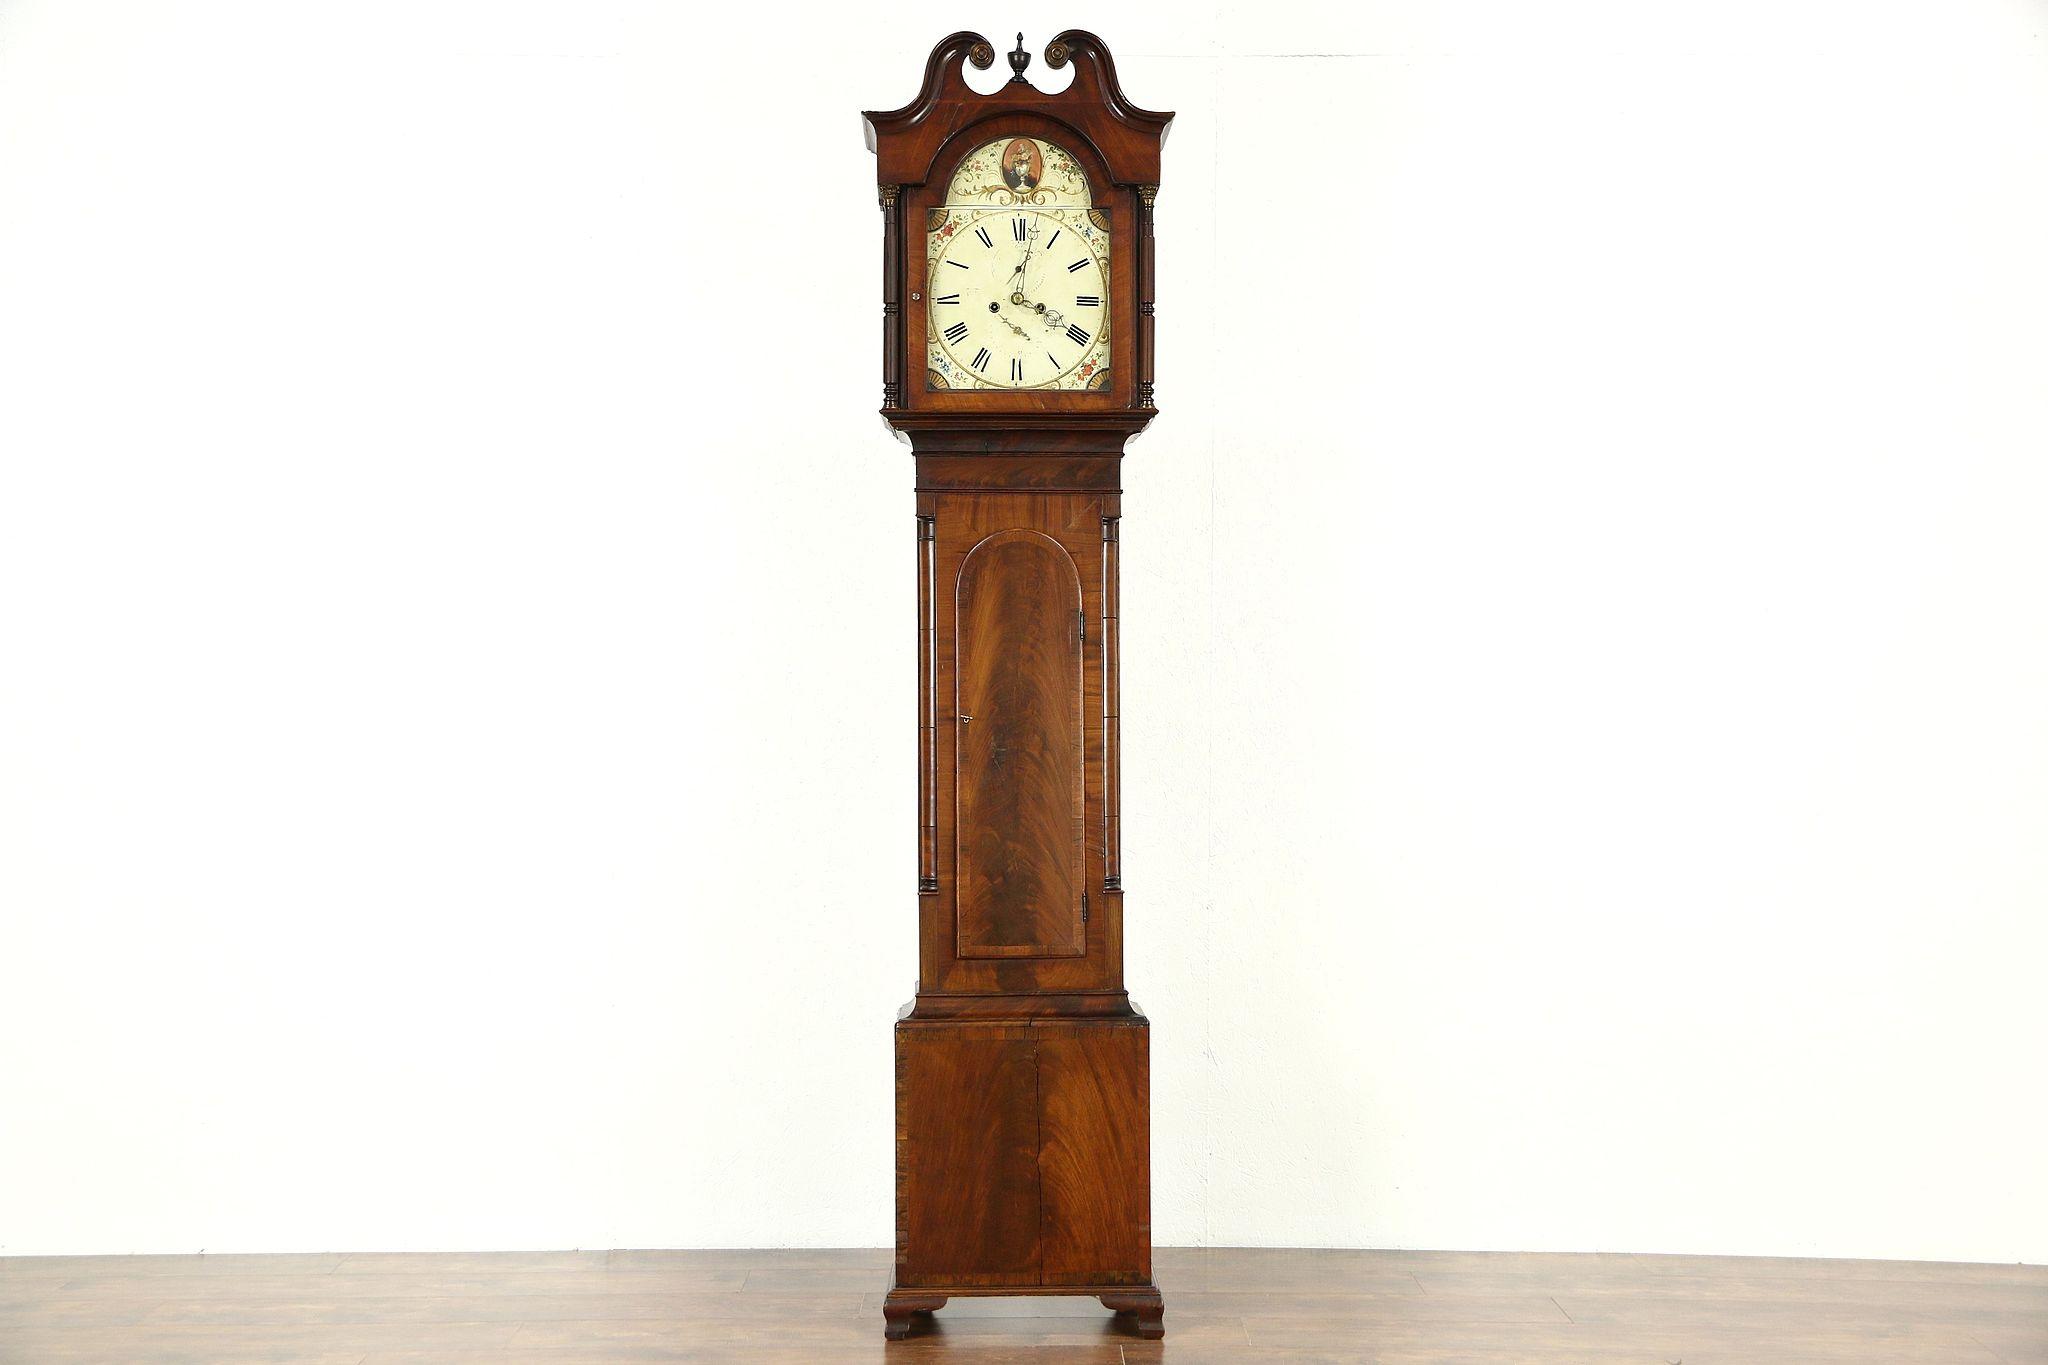 Scottish Georgian 1825 Antique Tall Case Grandfather Clock  Picken of  Edinburgh. Scottish Georgian 1825 Antique Tall Case Grandfather Clock  Picken